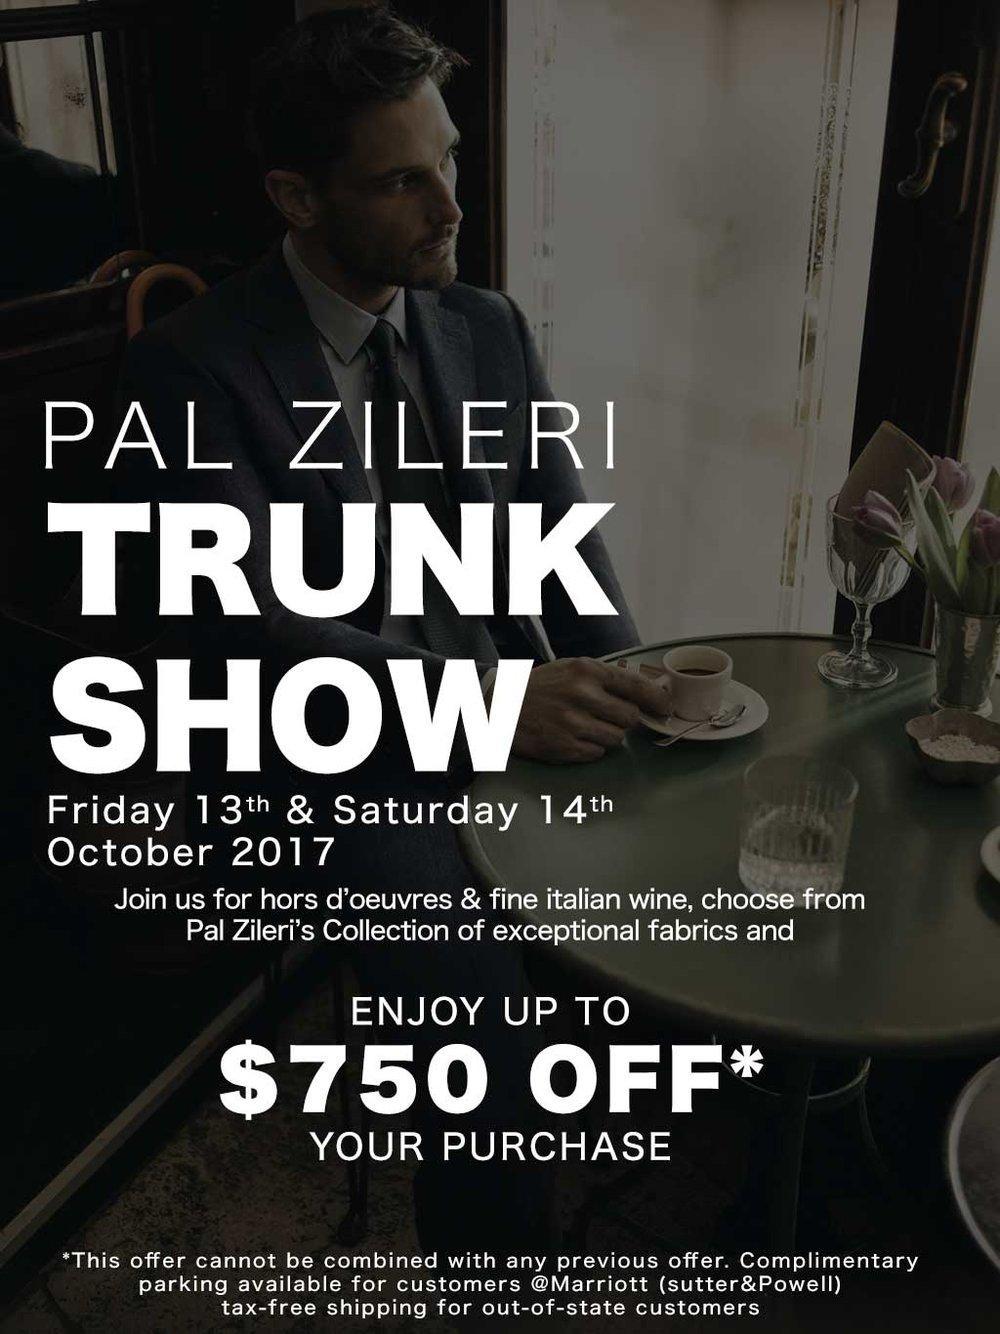 pz-trunkshow-fw2017.jpg